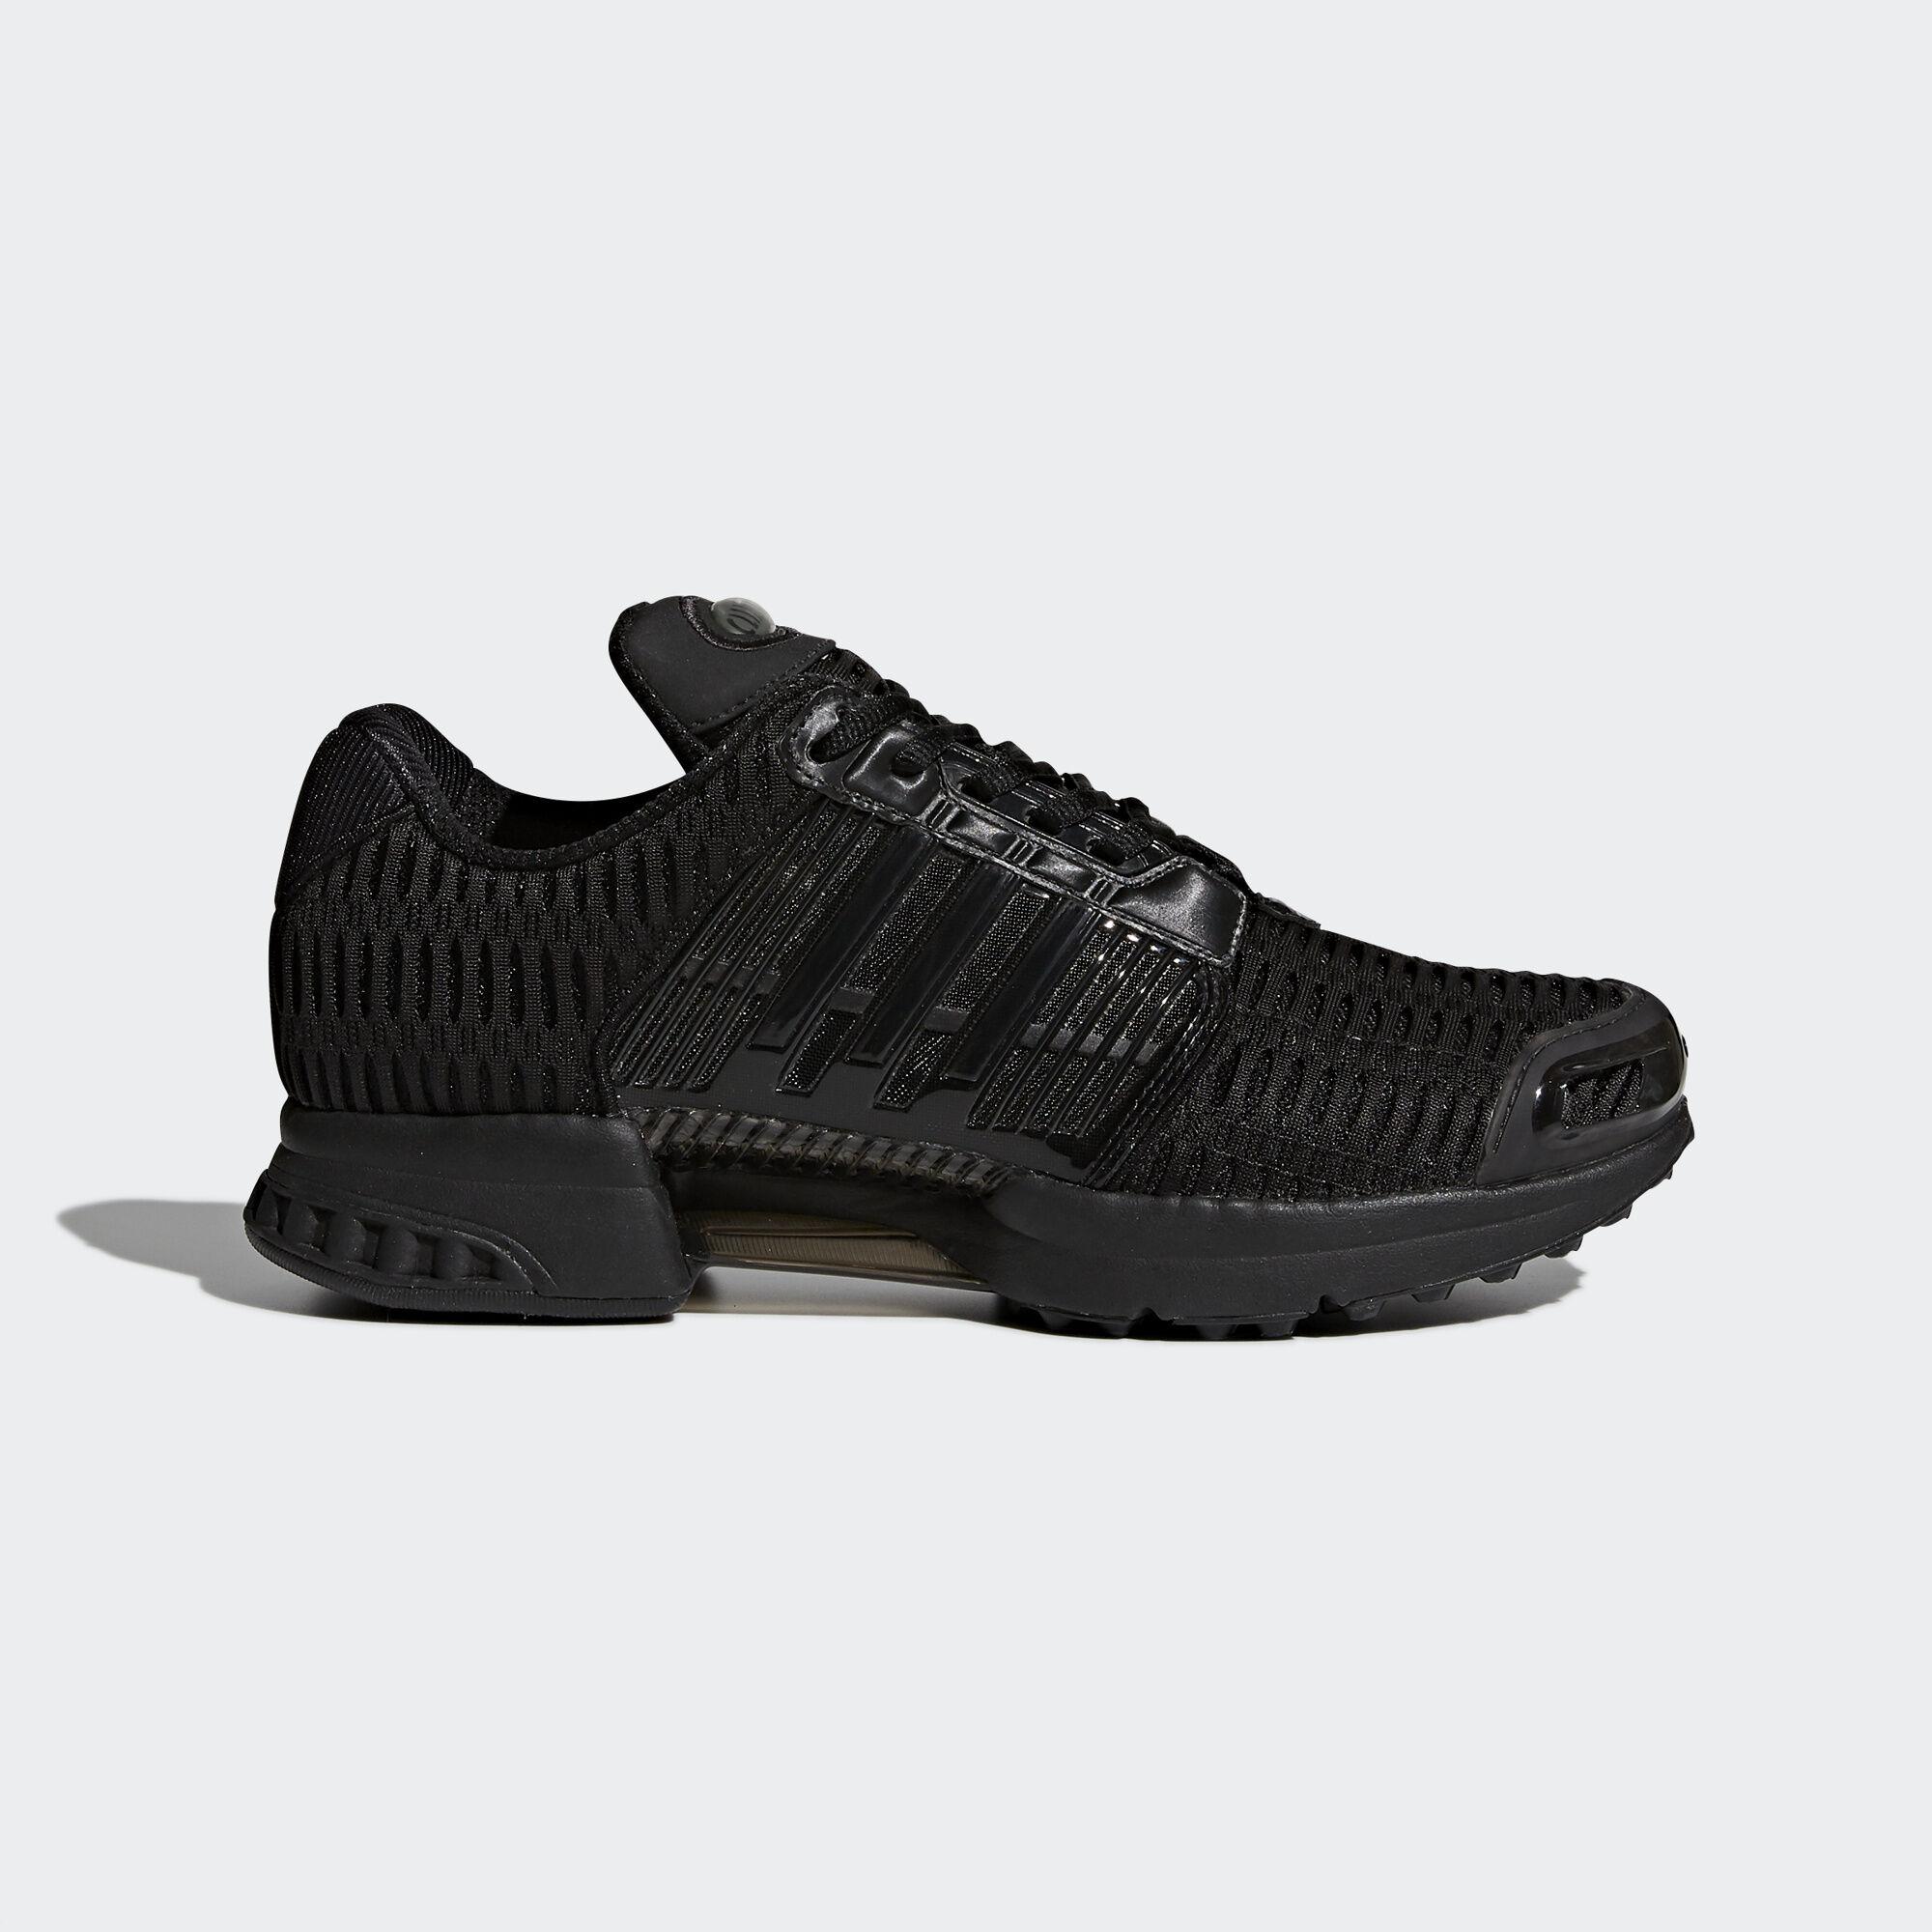 Adidas Climacool Bounce Full Black